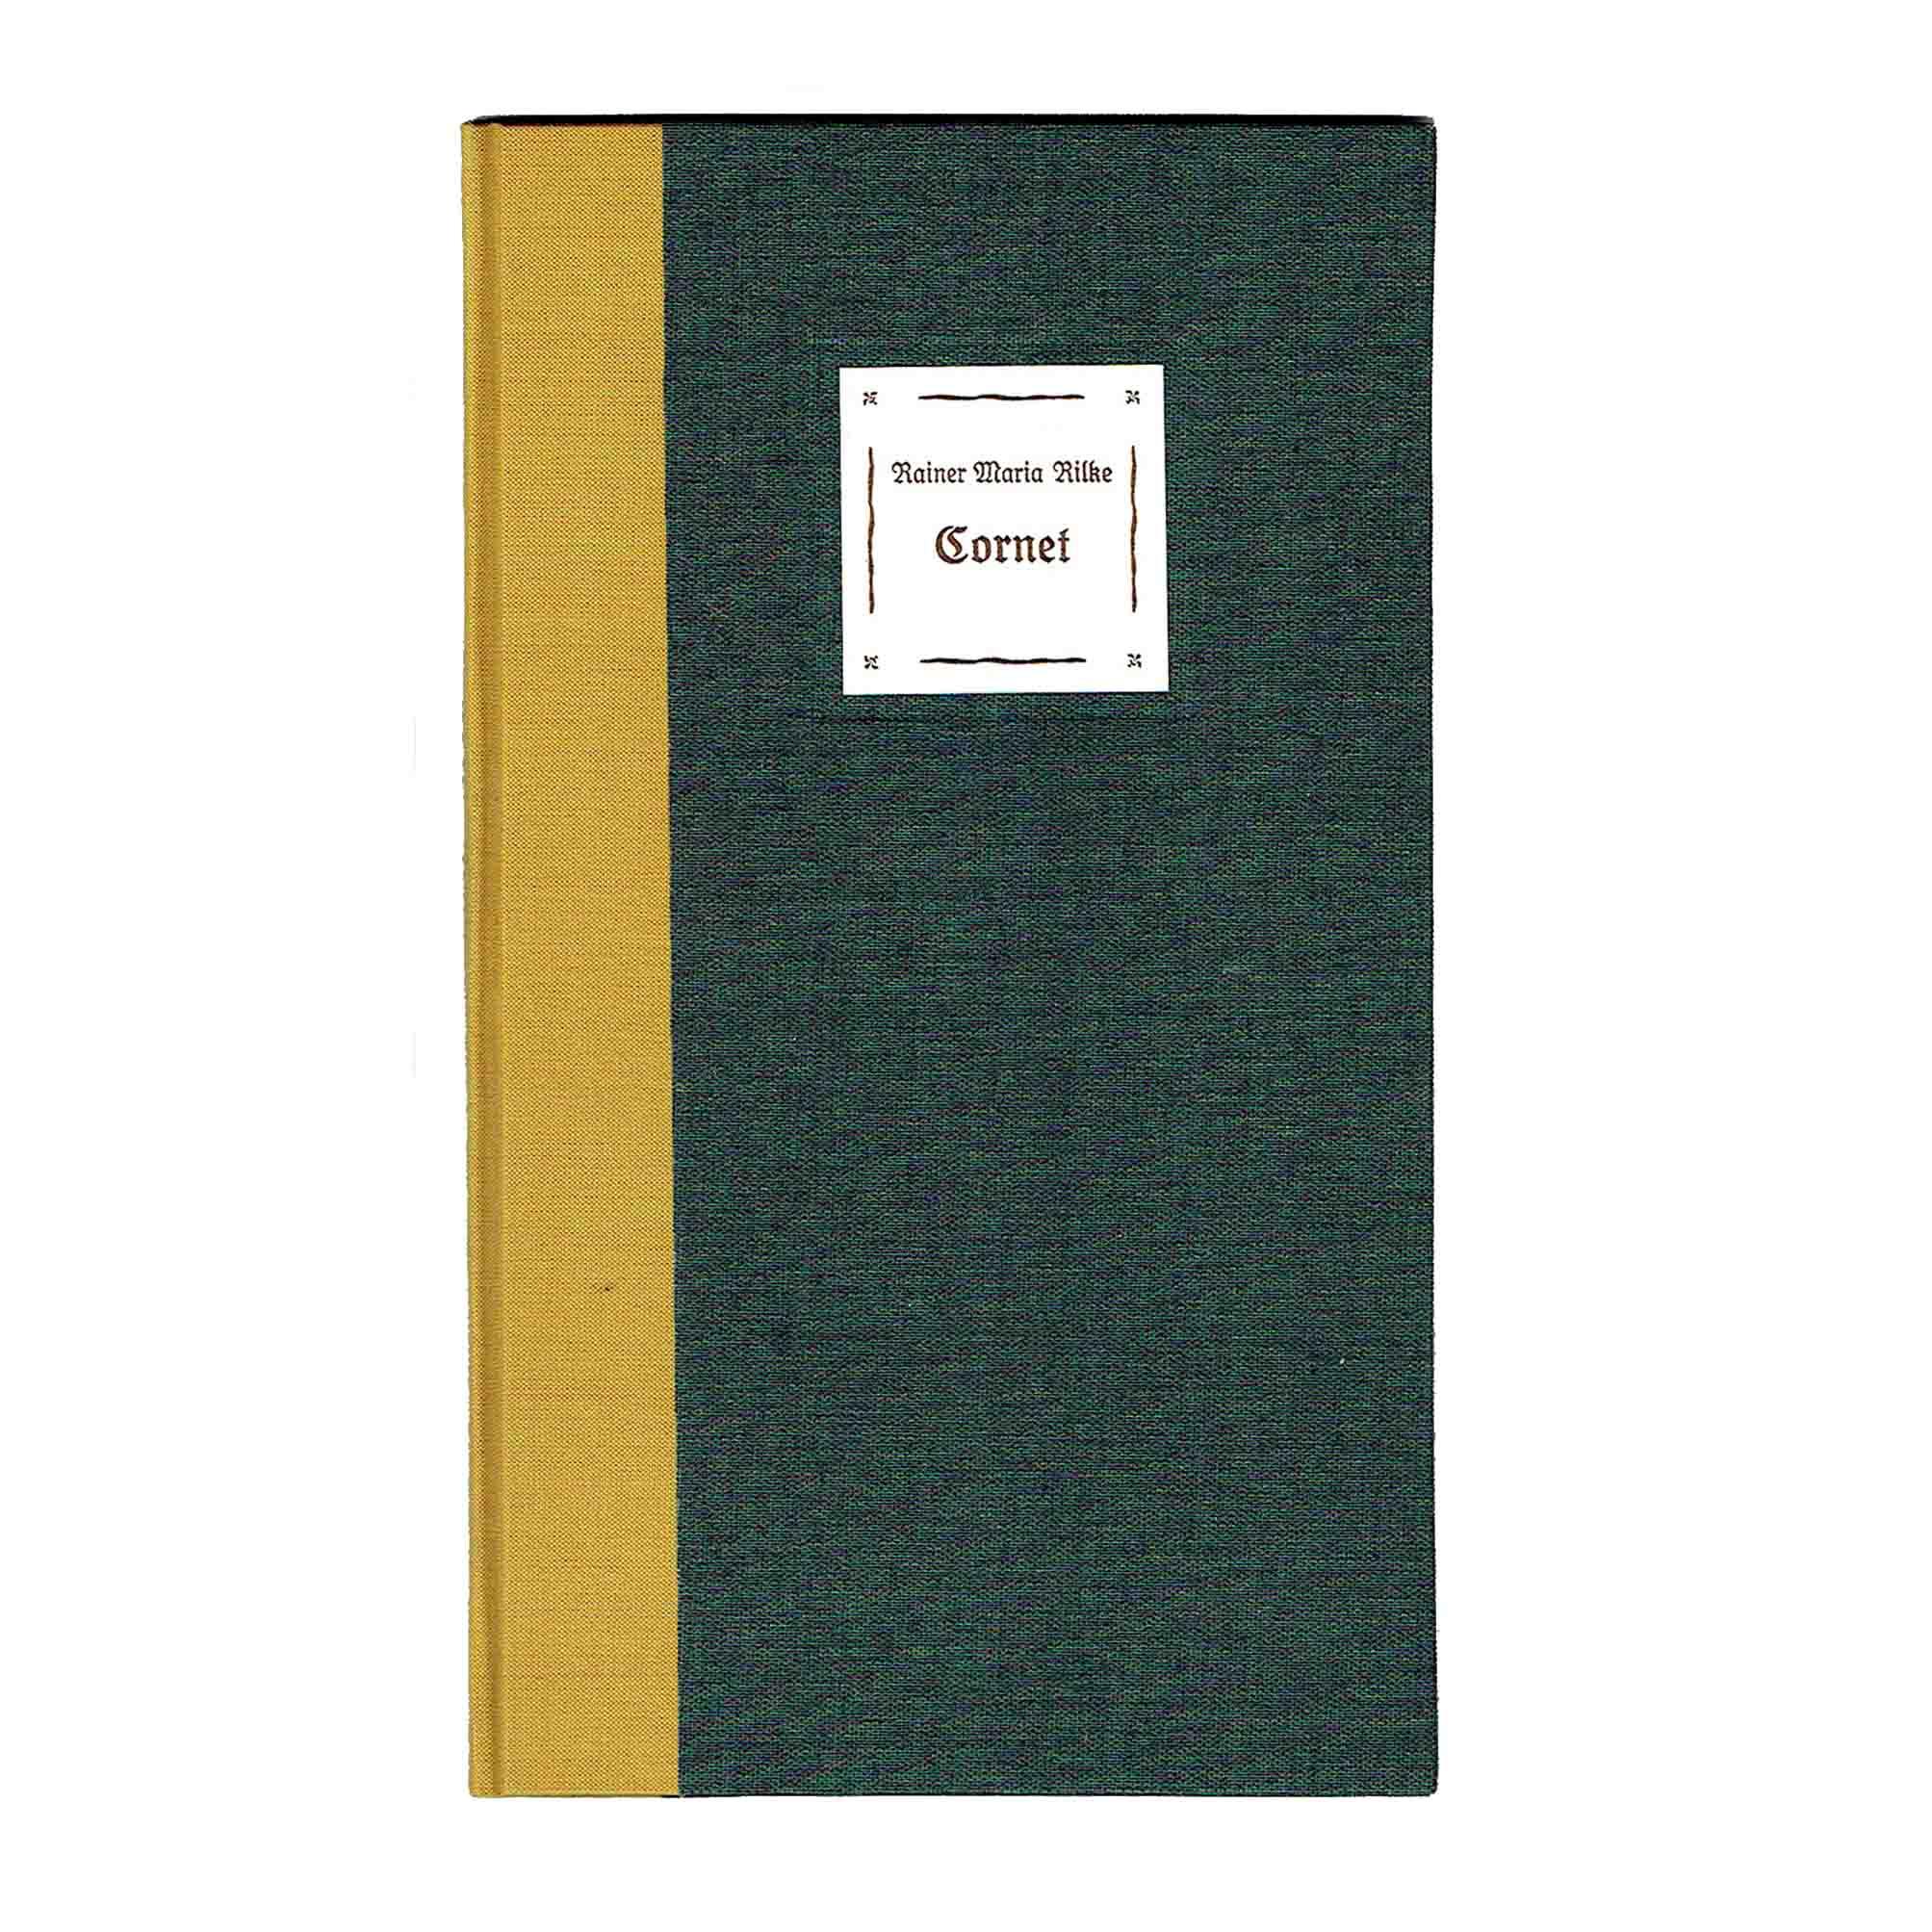 5960 Rilke Kuhn Cornet Num Sign Burgenland 1988 Einband frei N